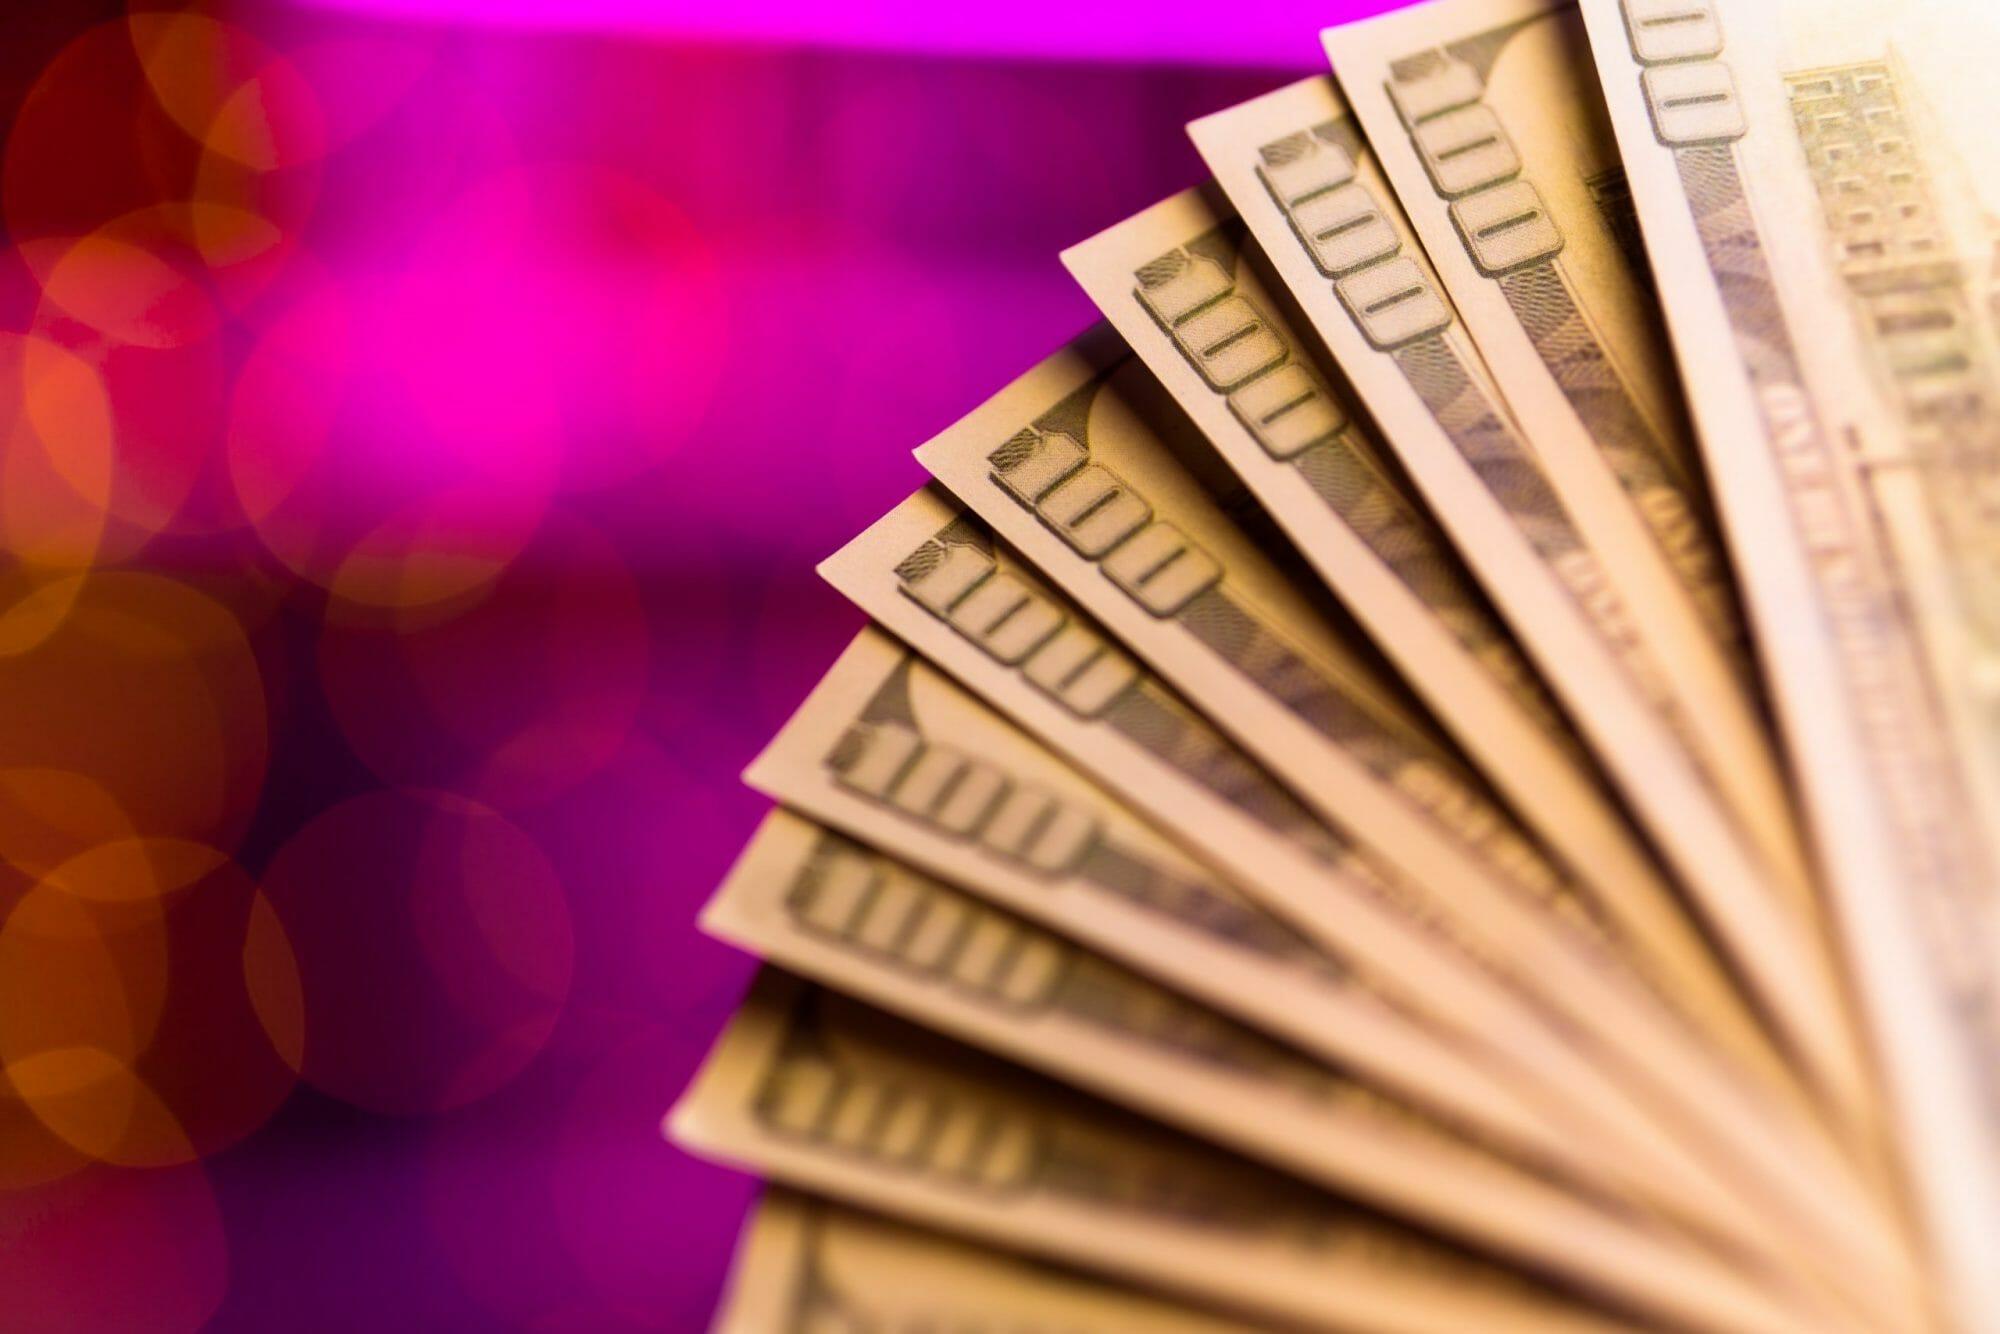 Many-dollar-bills-on-pink-background-965596-scaled